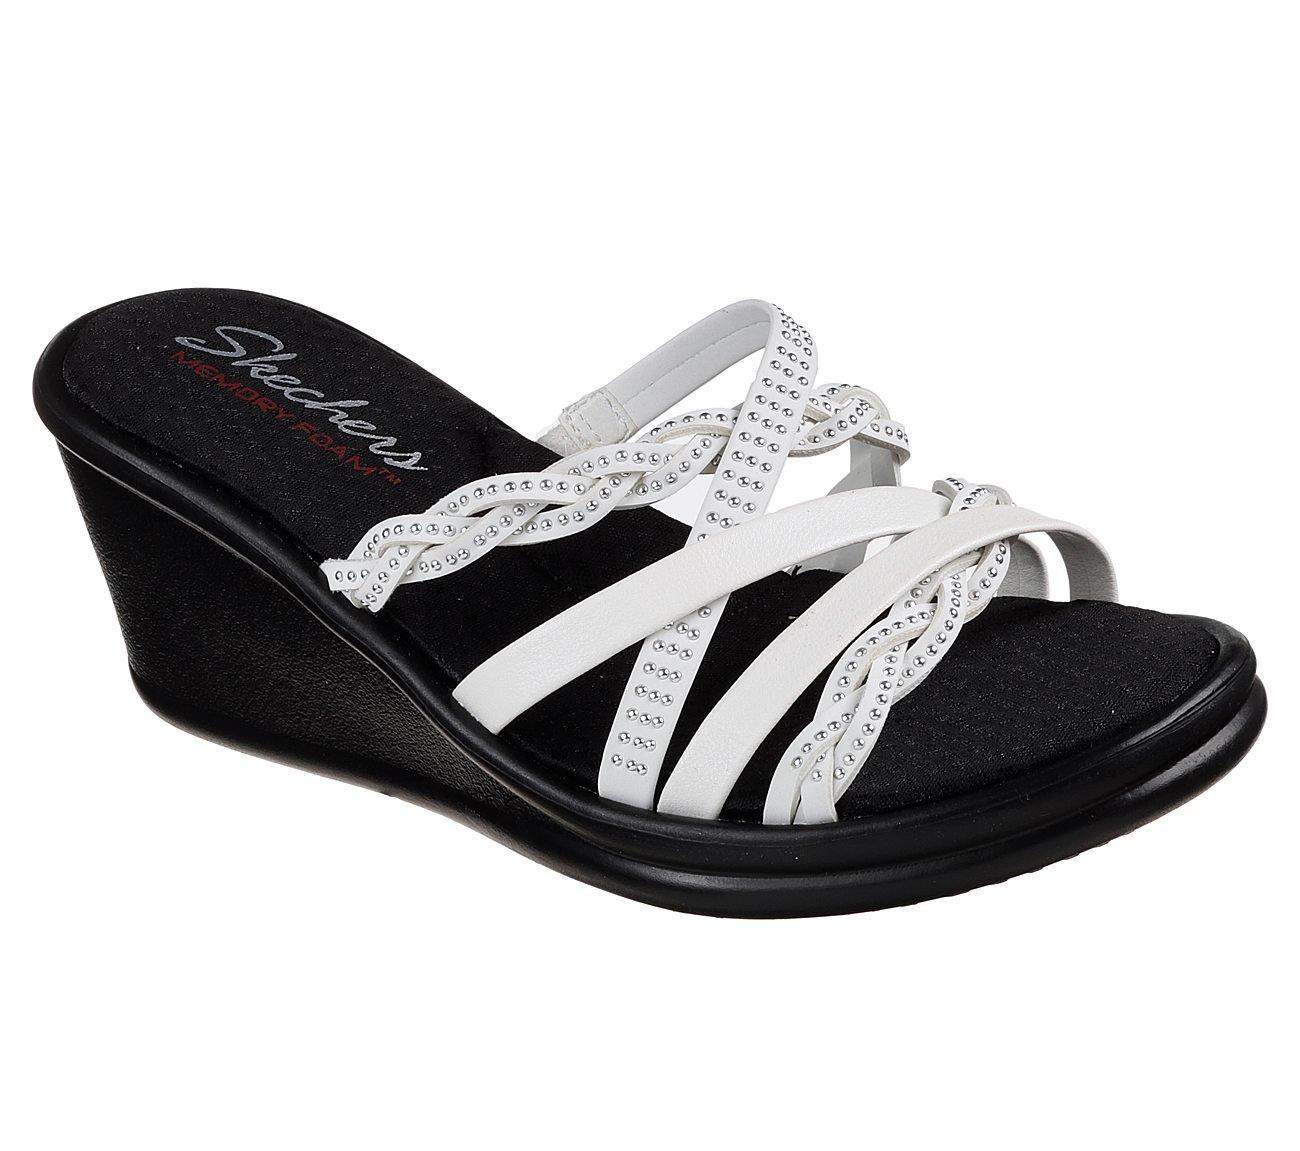 Skechers Women's Rumblers Baubles-Beaded Multi-Strap Slide Wedge Sandal B07BHK6QW4 8 B(M) US|White